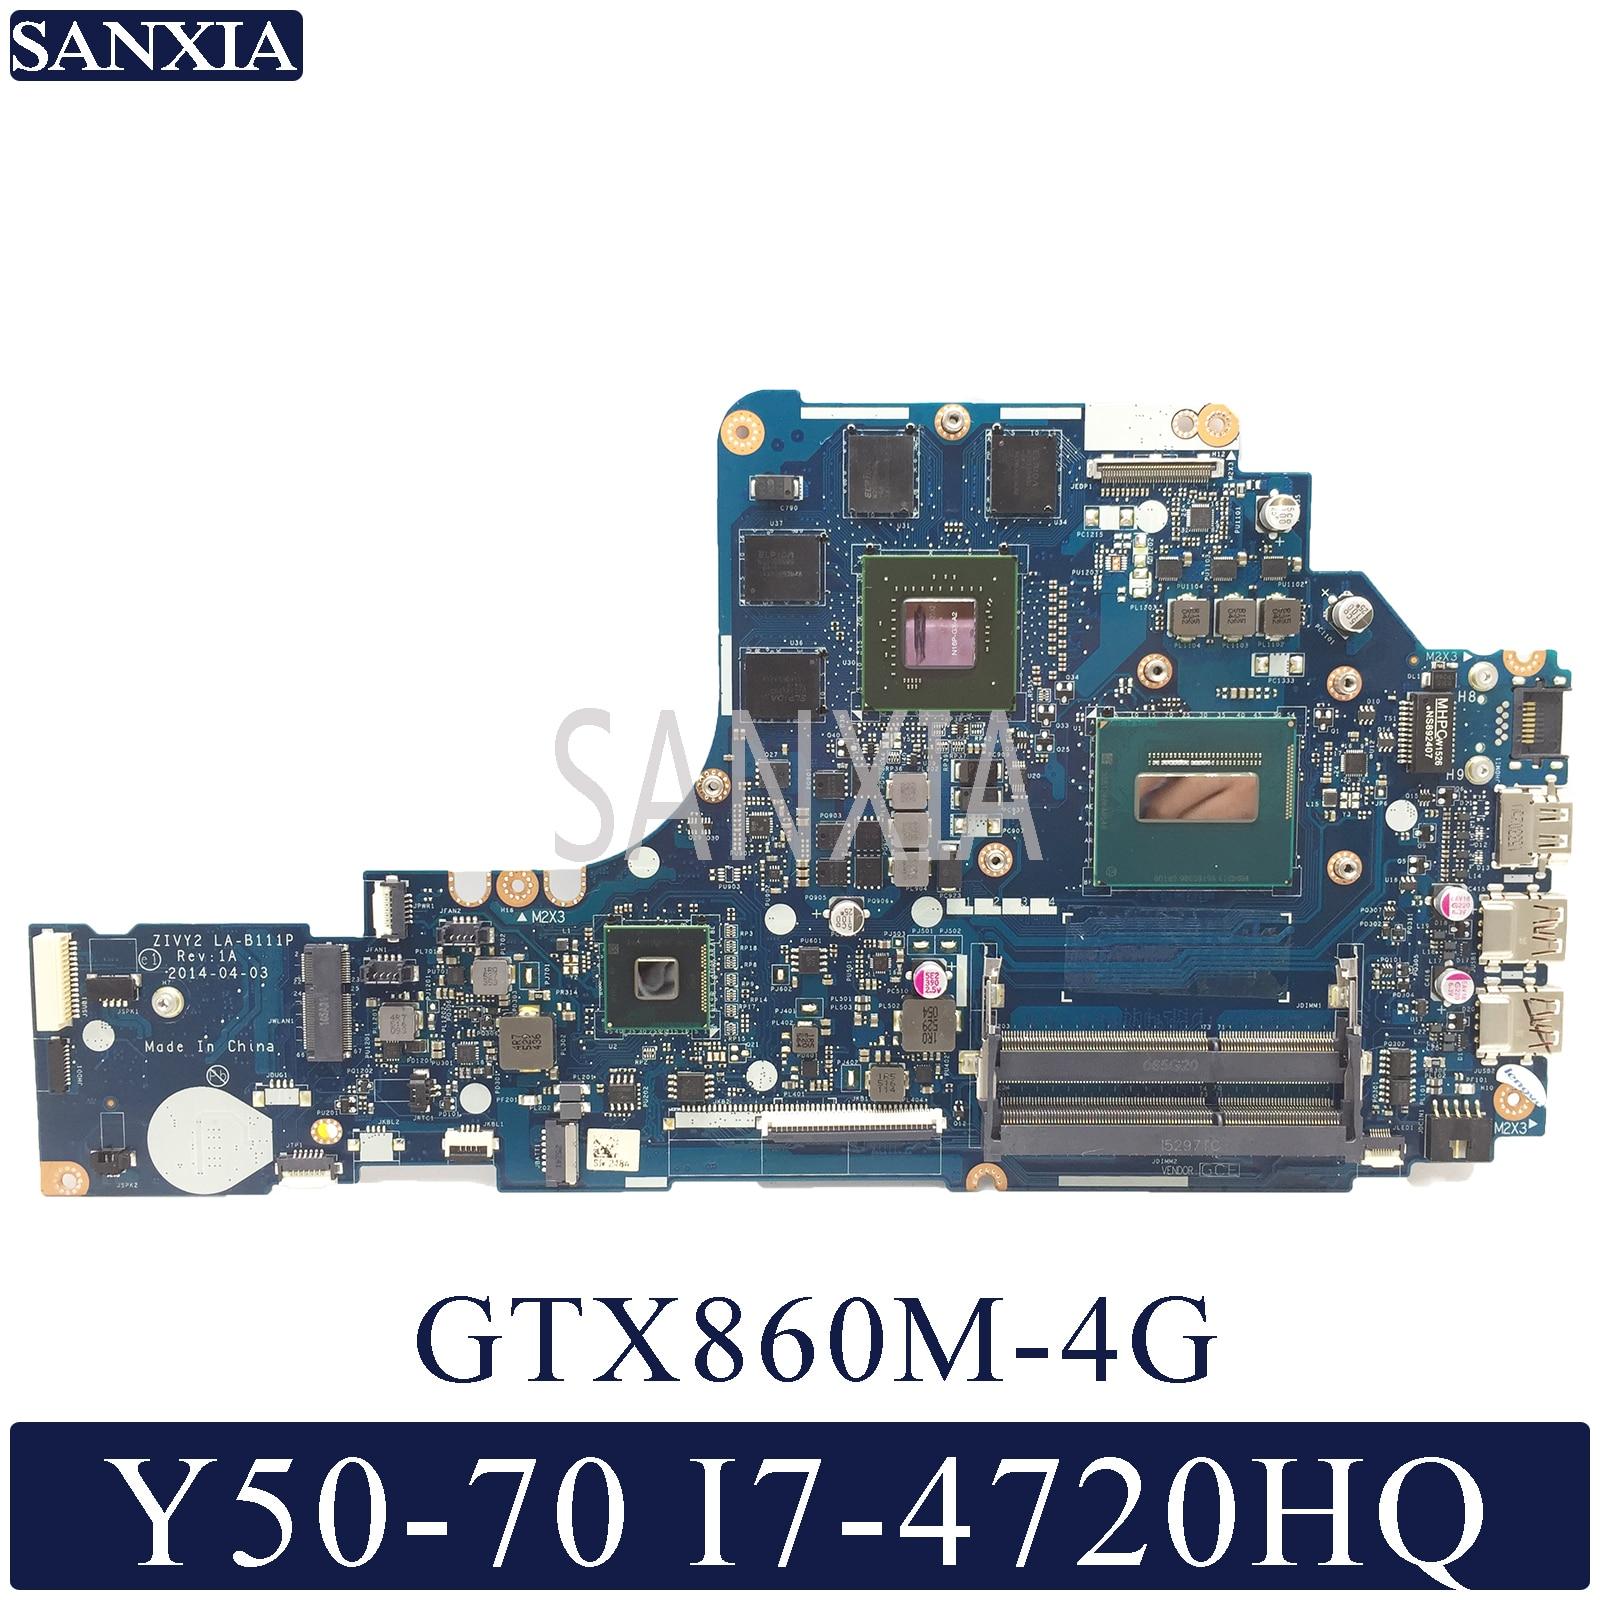 KEFU LA-B111P Laptop motherboard para Lenovo Y50-70 mainboard original I7-4720HQ/4710HQ GTX860M-4G